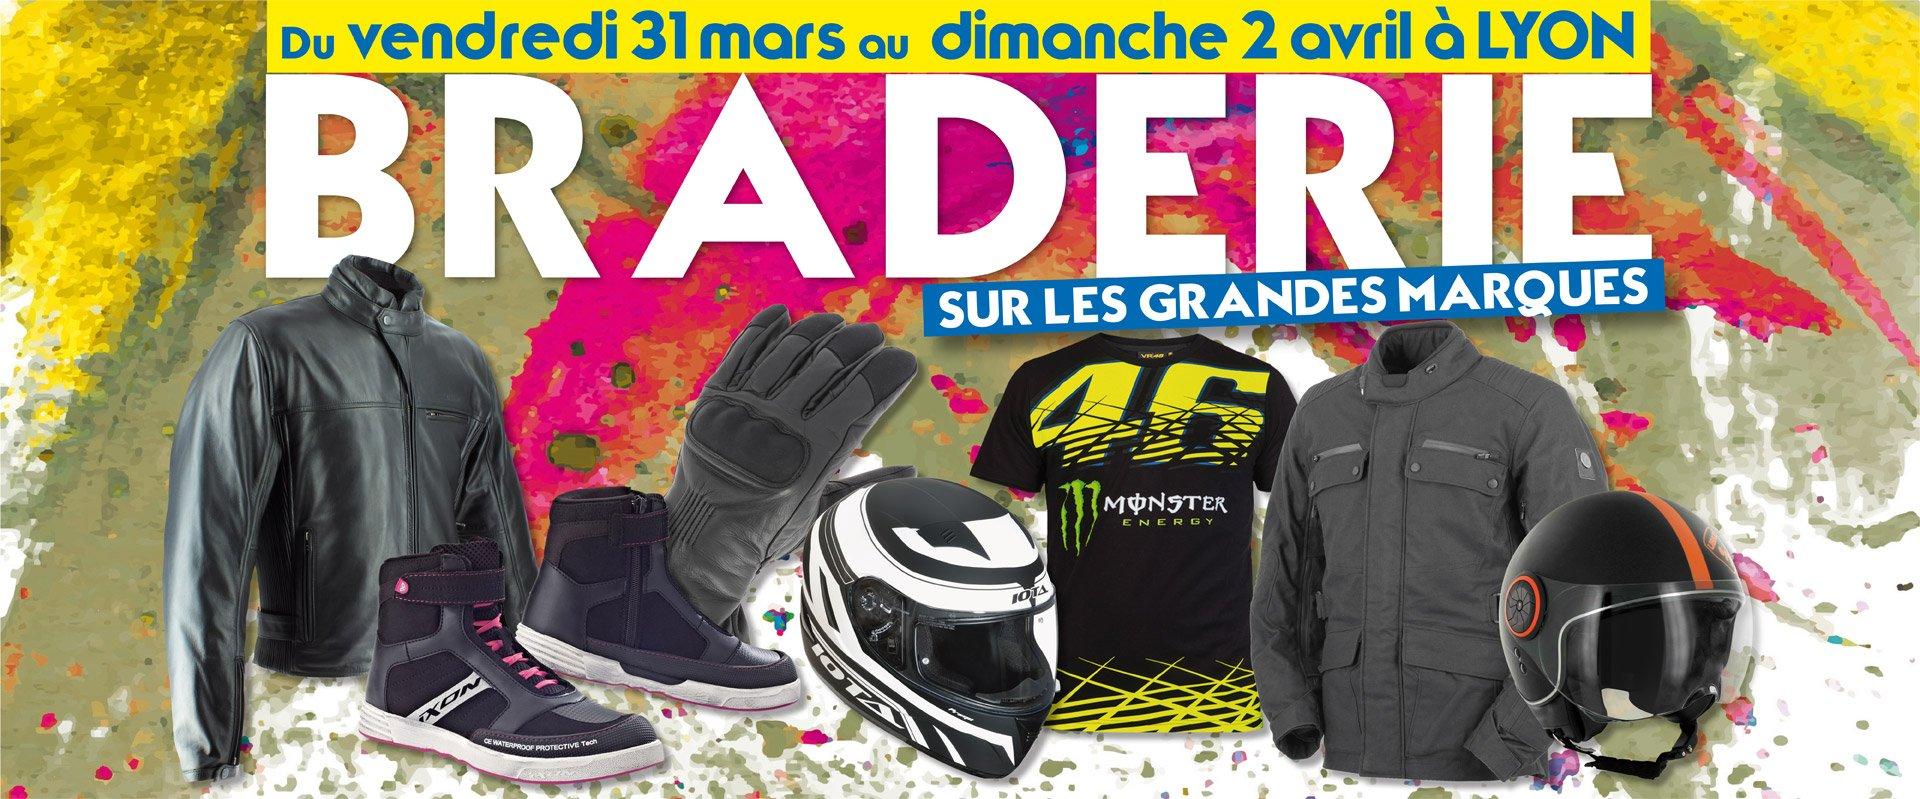 Braderies Cardy Lyon